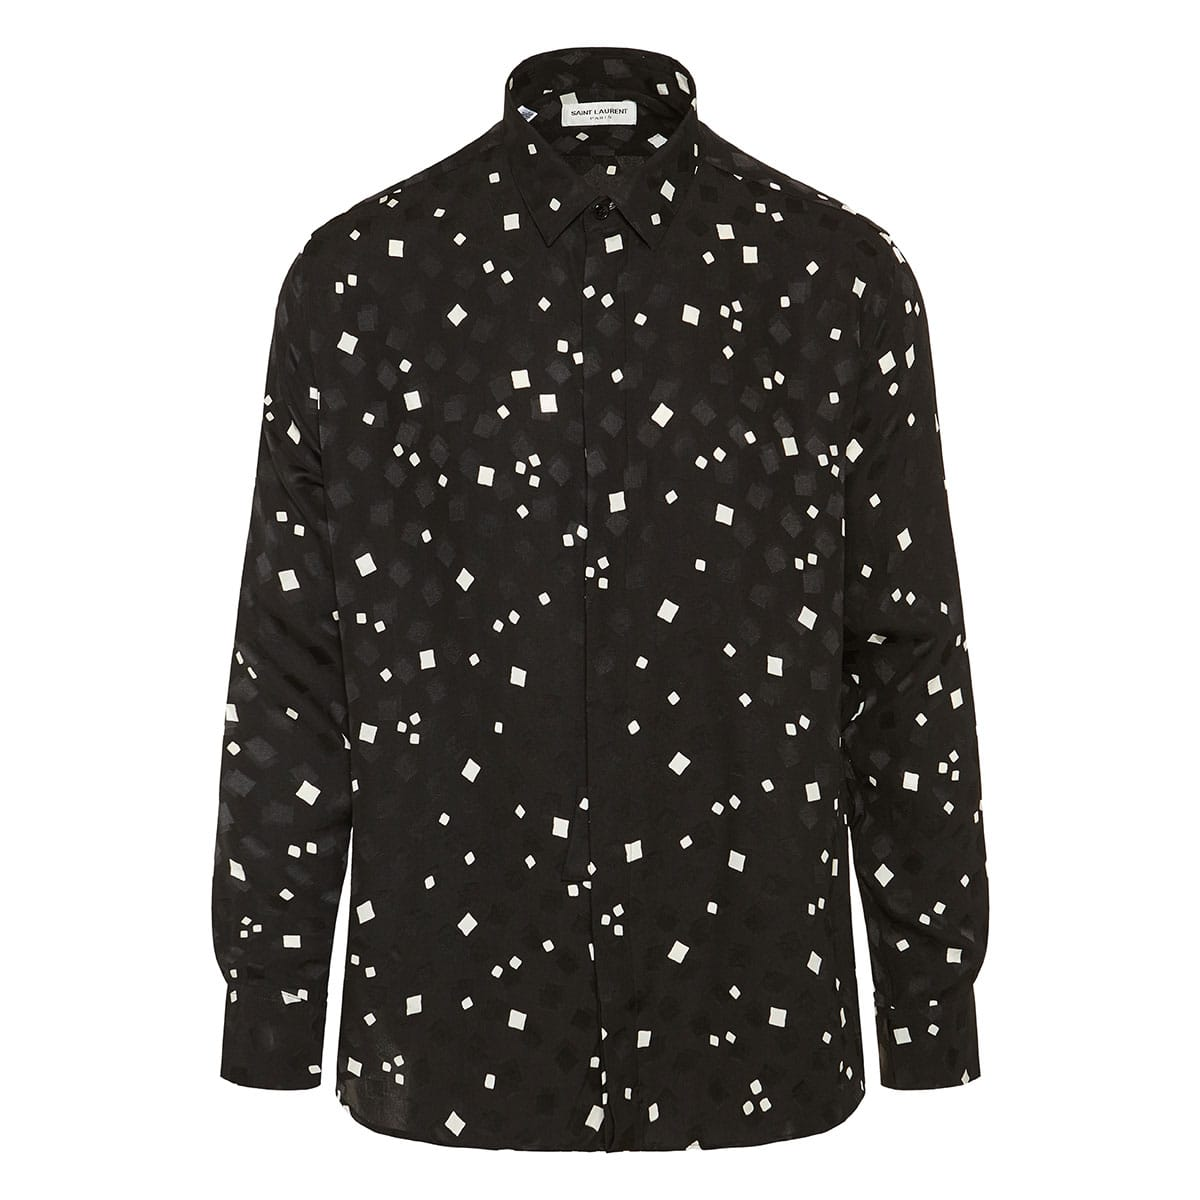 Graphic-print jacquard silk shirt